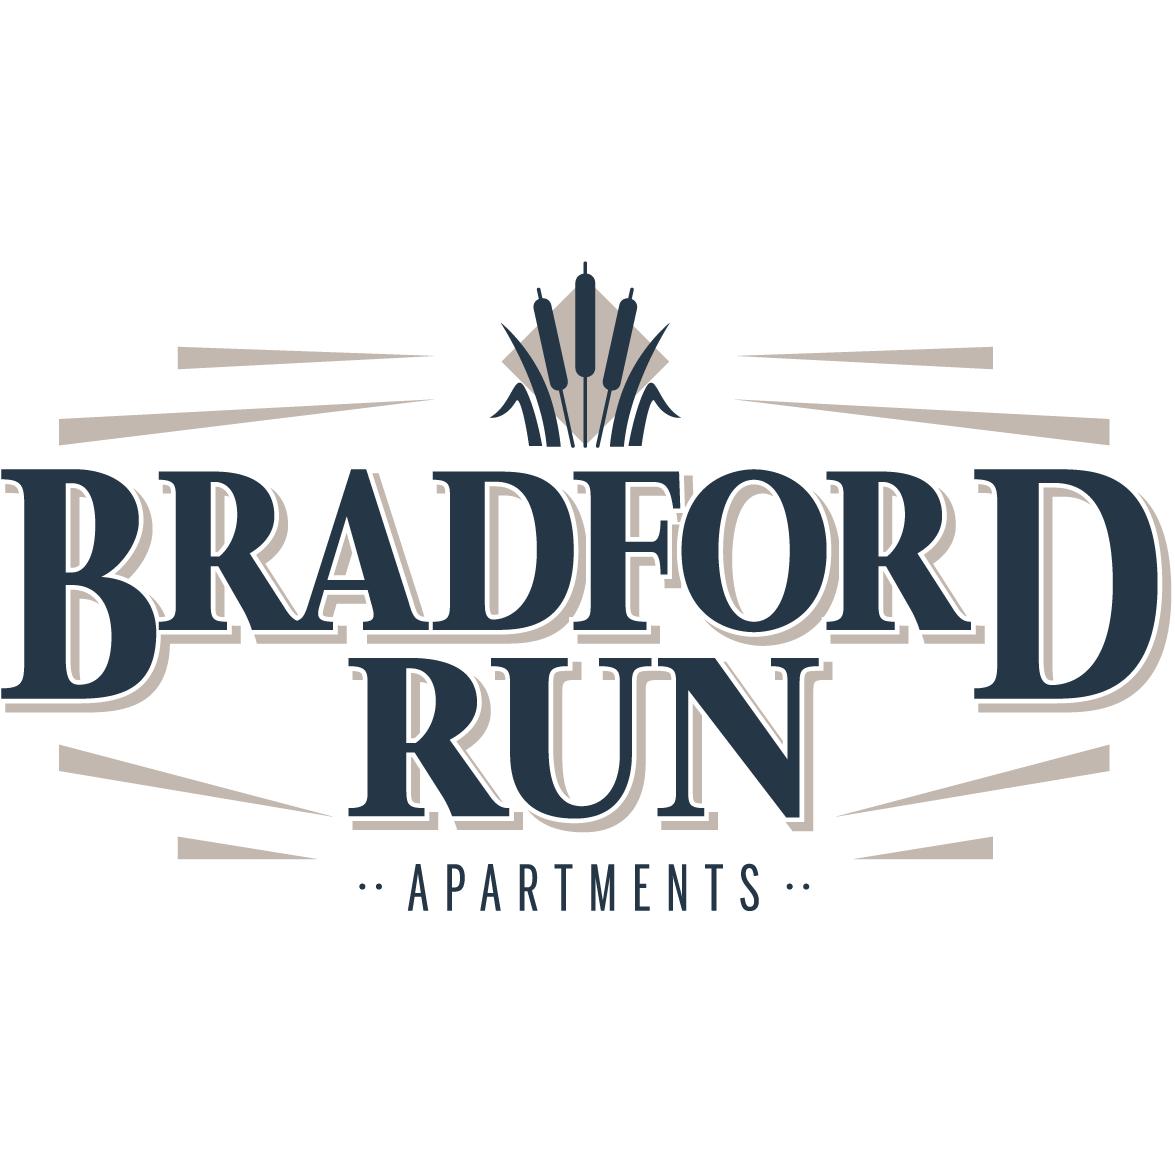 Bradford Run